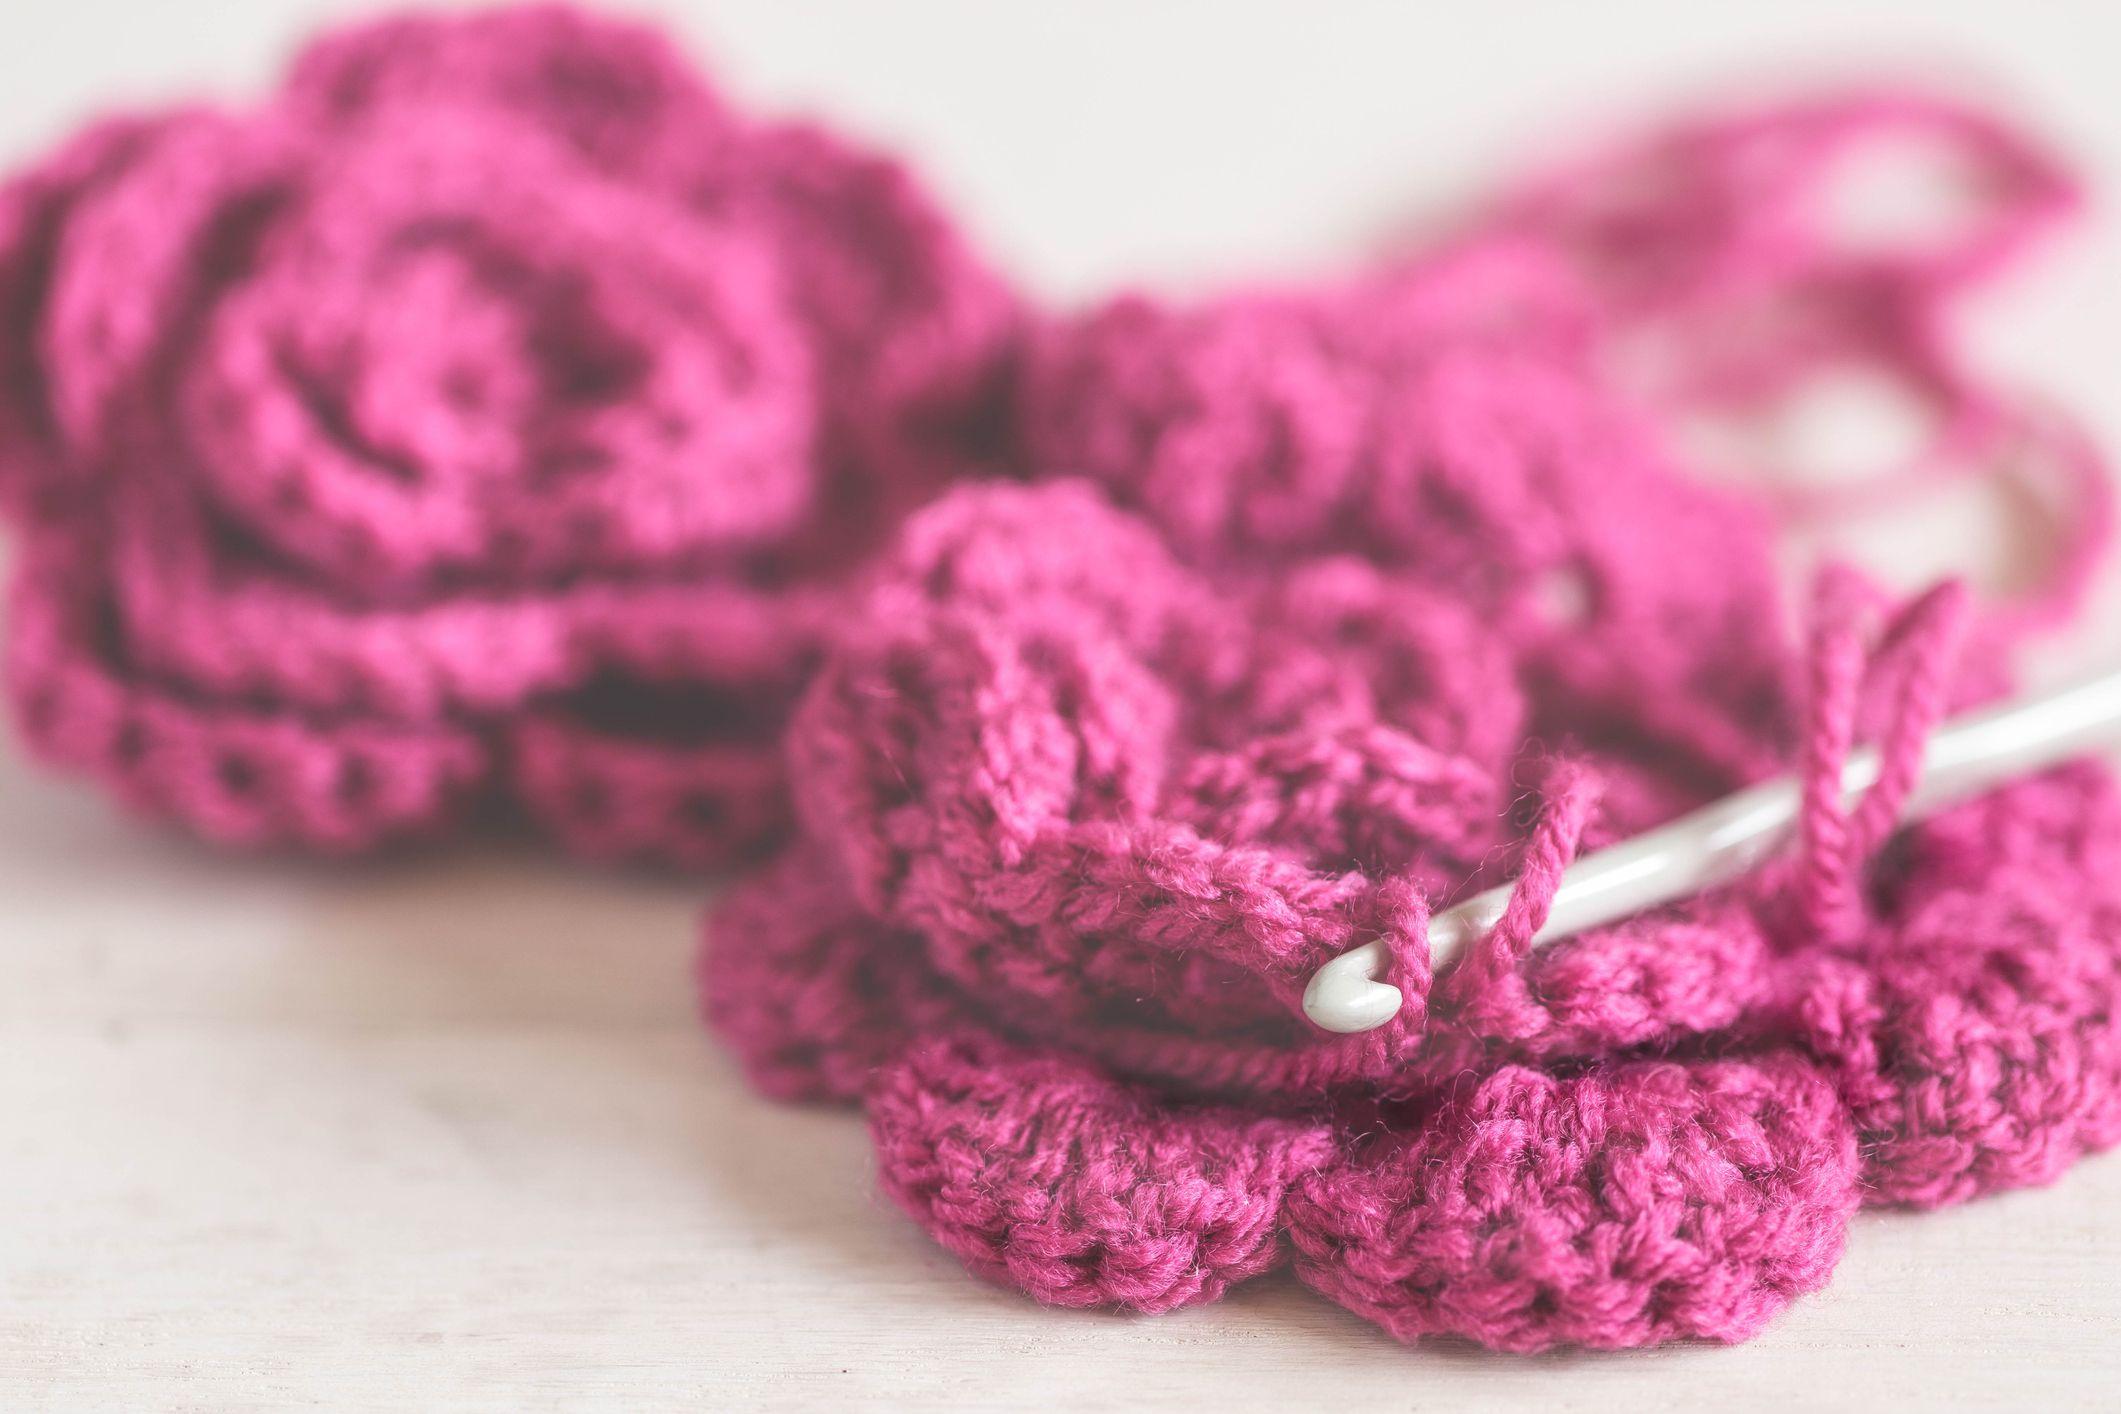 Crochet Crocheting Definition